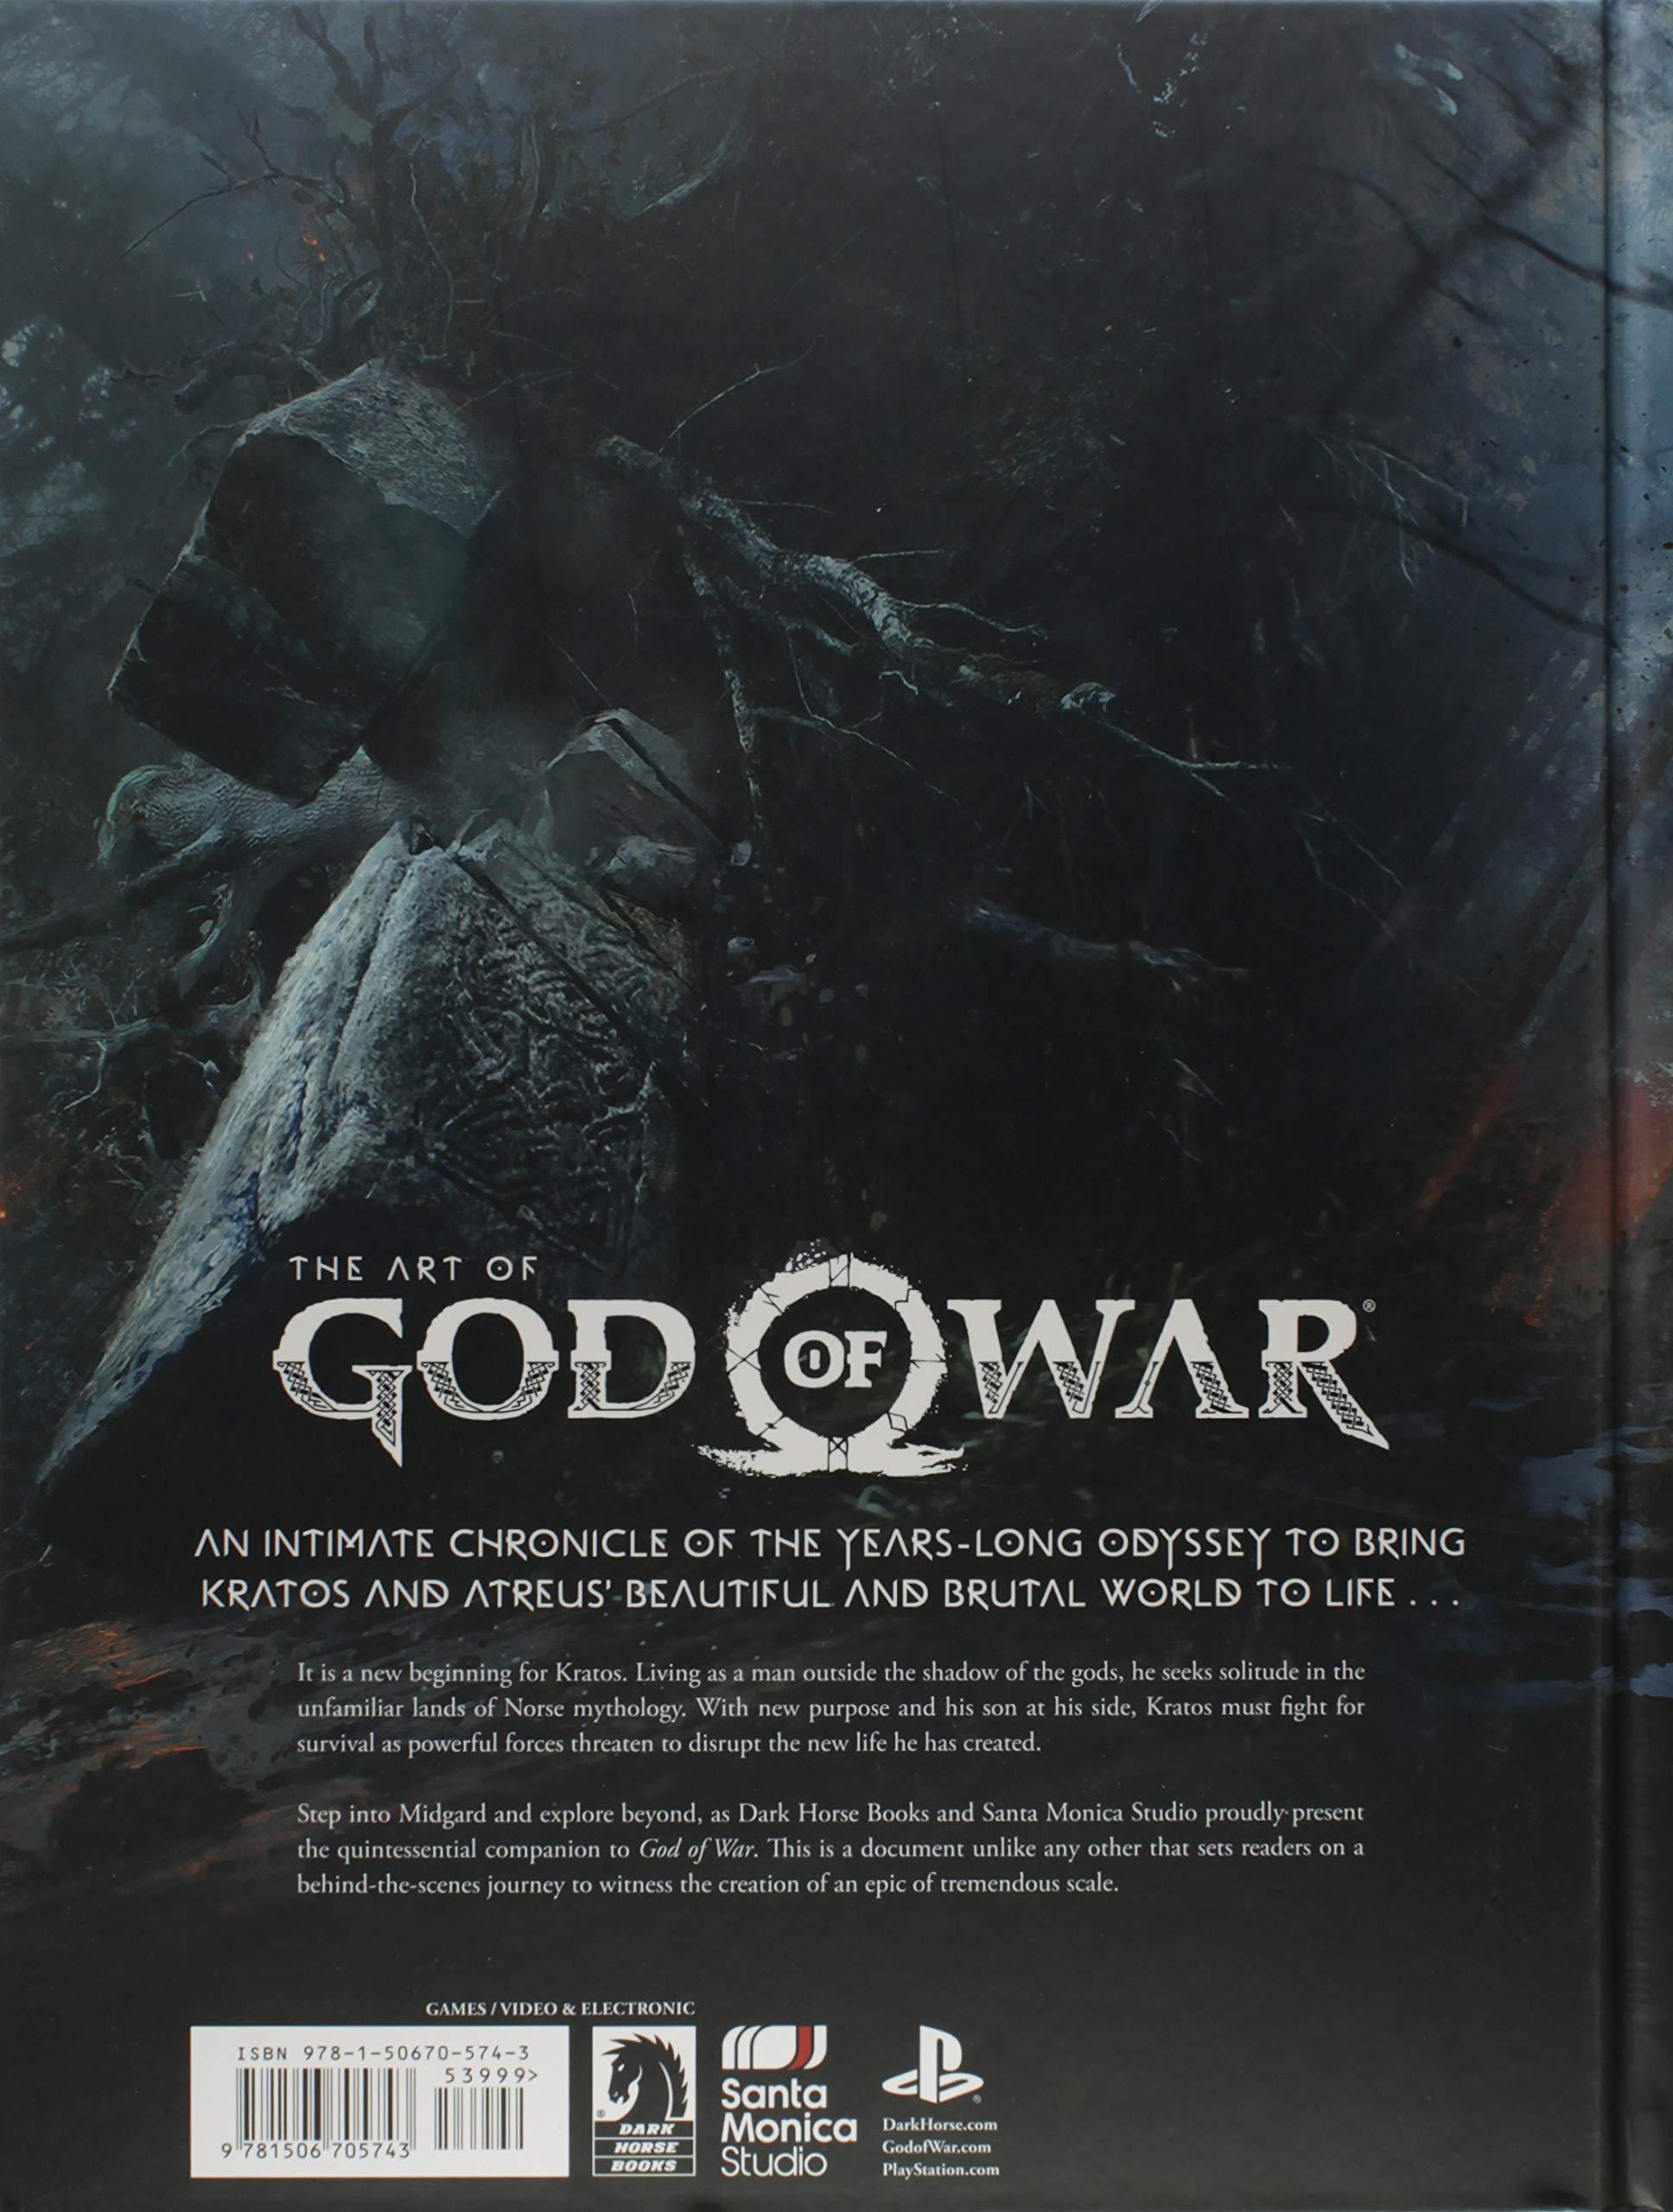 The Art of God of War 2